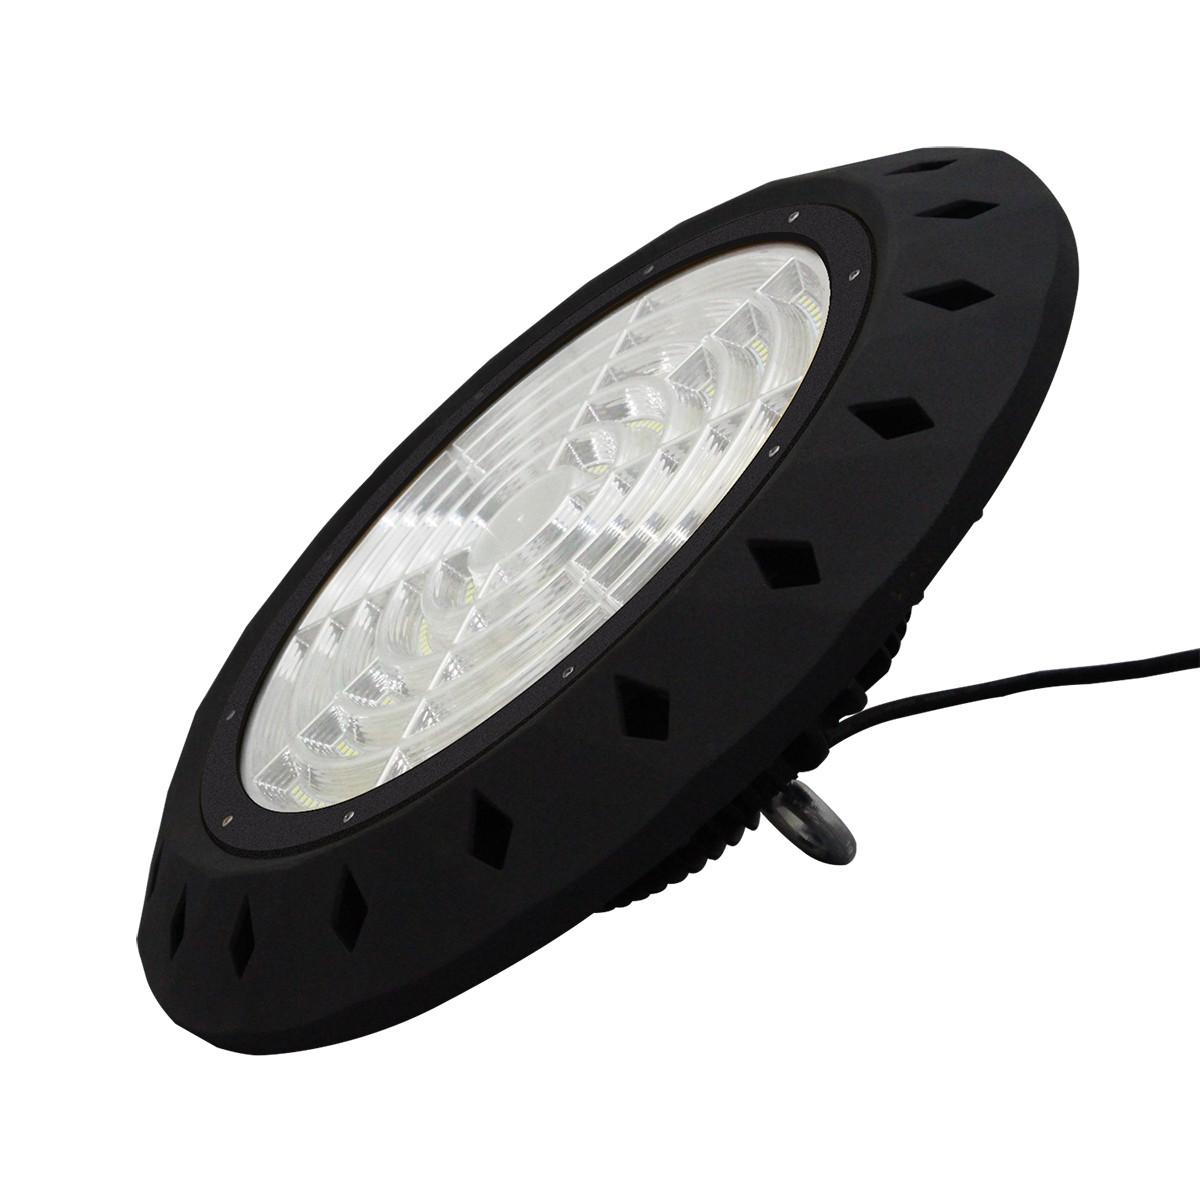 LED UFO High Bay 100W - Aigi - Magazijnverlichting - Waterdicht IP65 - Natuurlijk Wit 4000K - Alumin